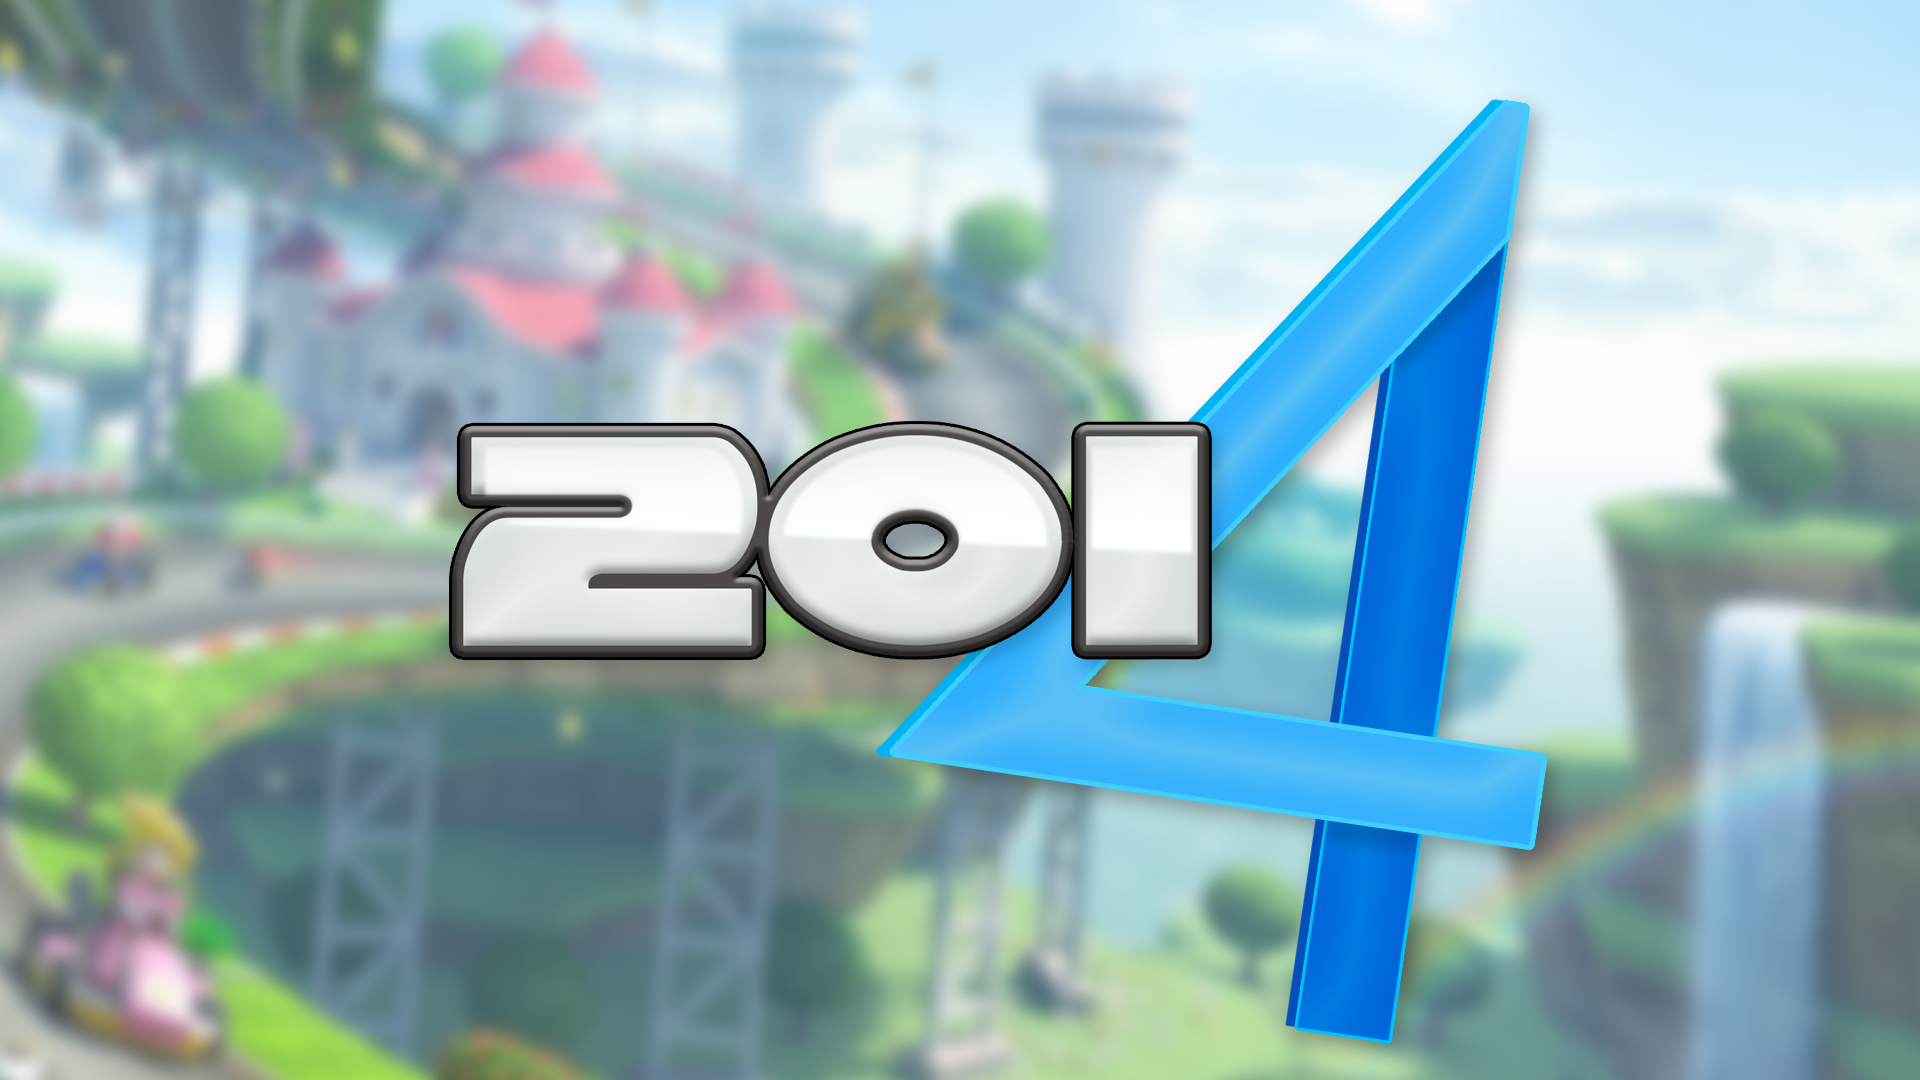 2014 Mario Kart 8.jpg